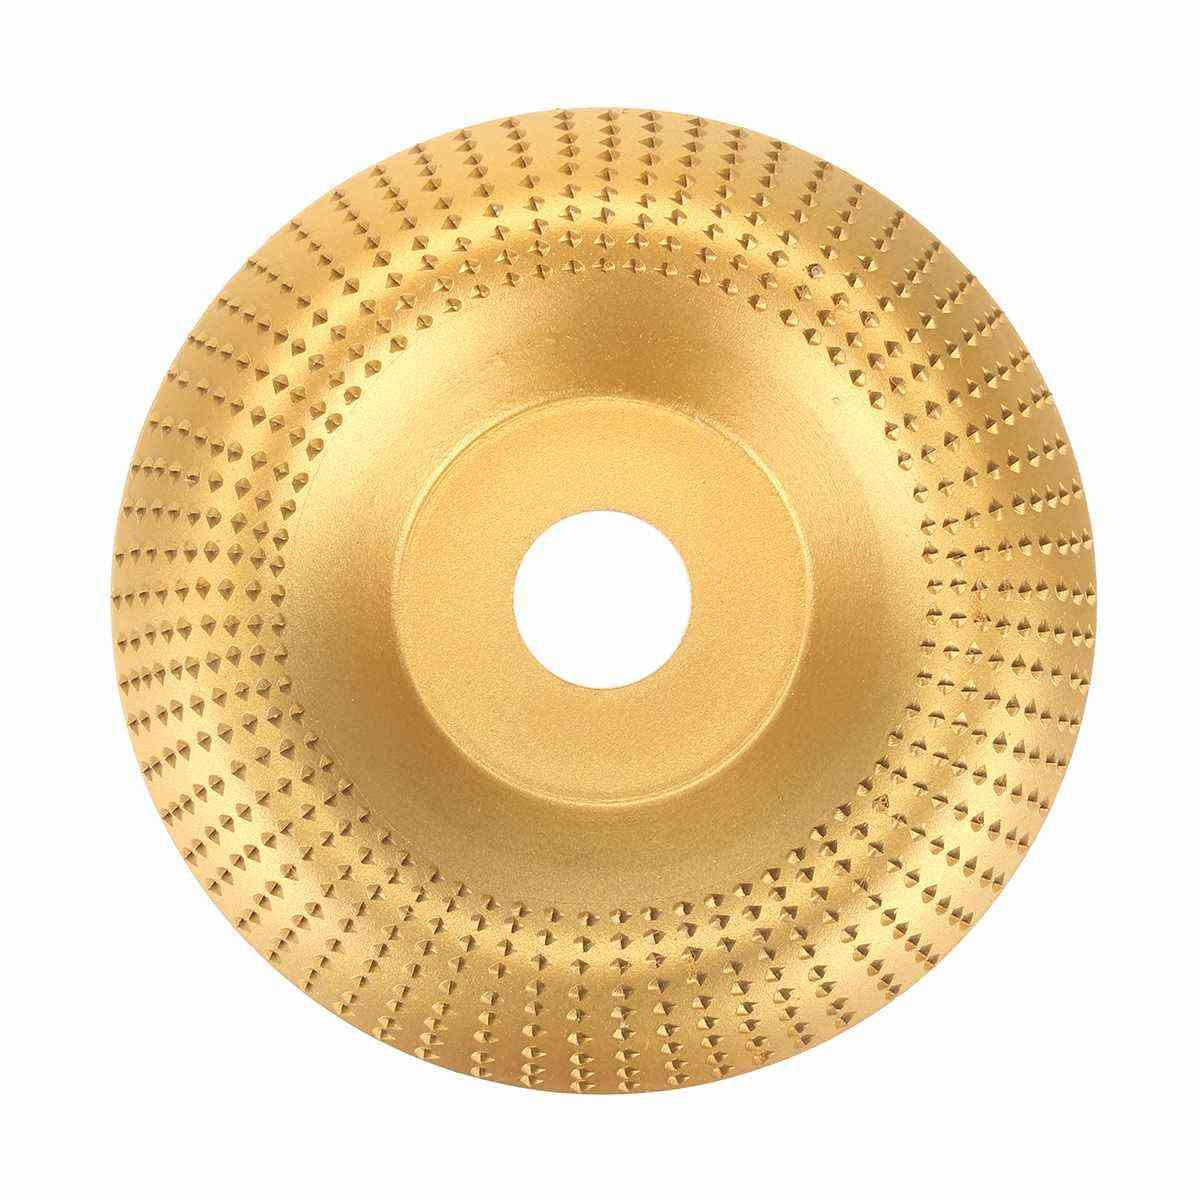 Wood Shaping Disc, Angle Grinding Wheel